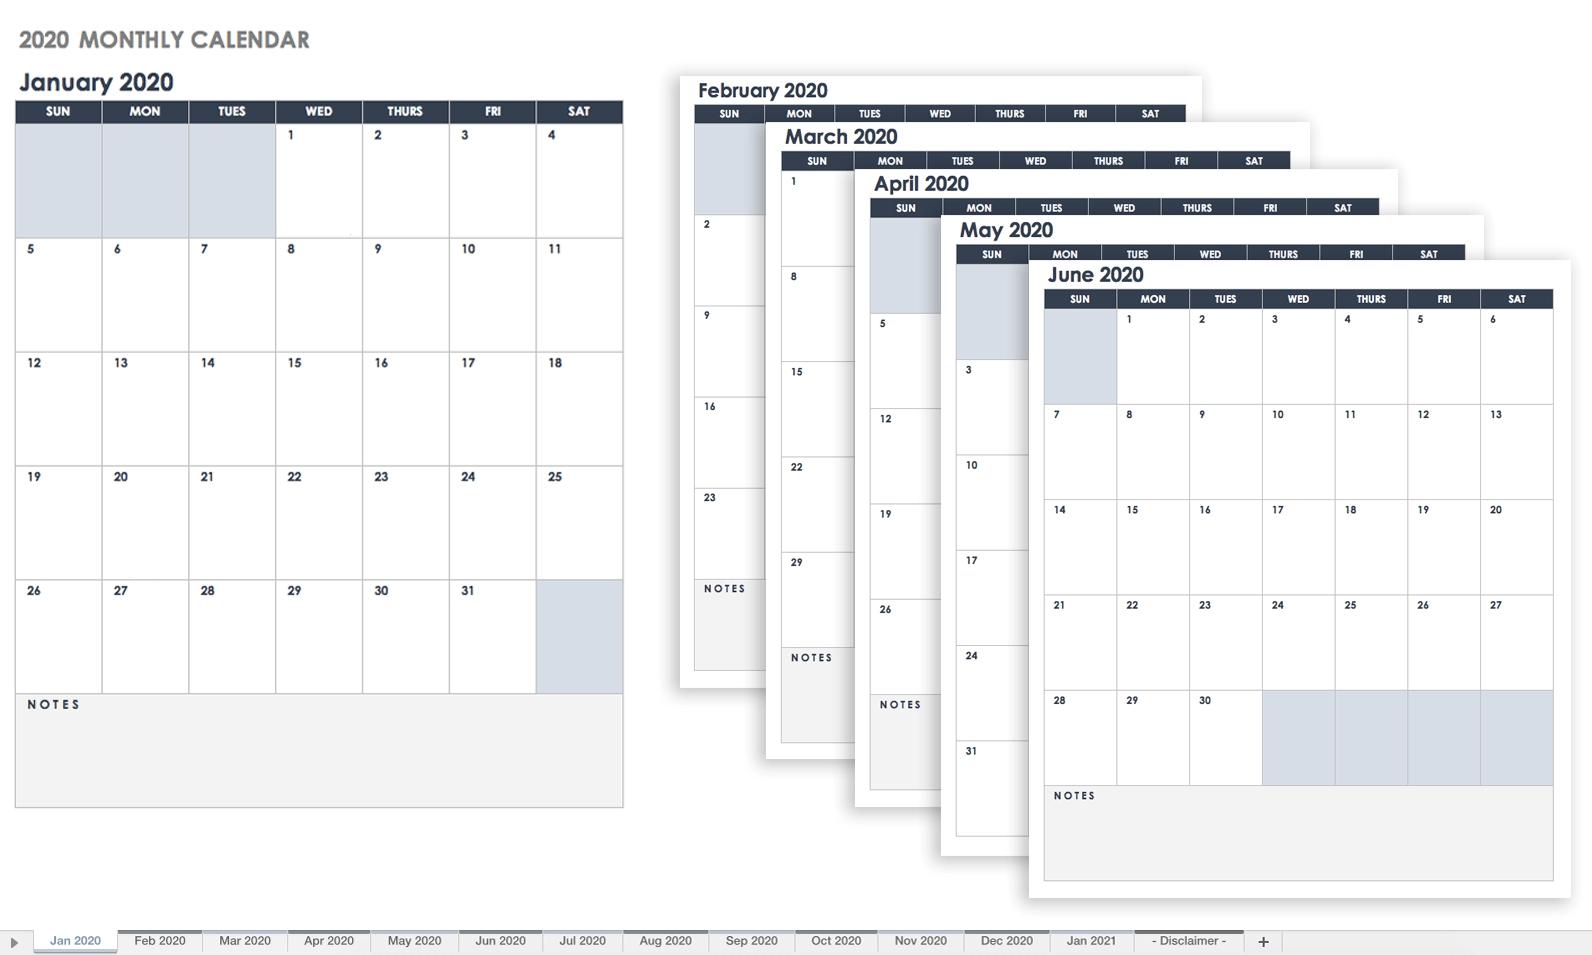 Free Google Calendar Templates | Smartsheet with regard to 2020 Google Sheets Calendar